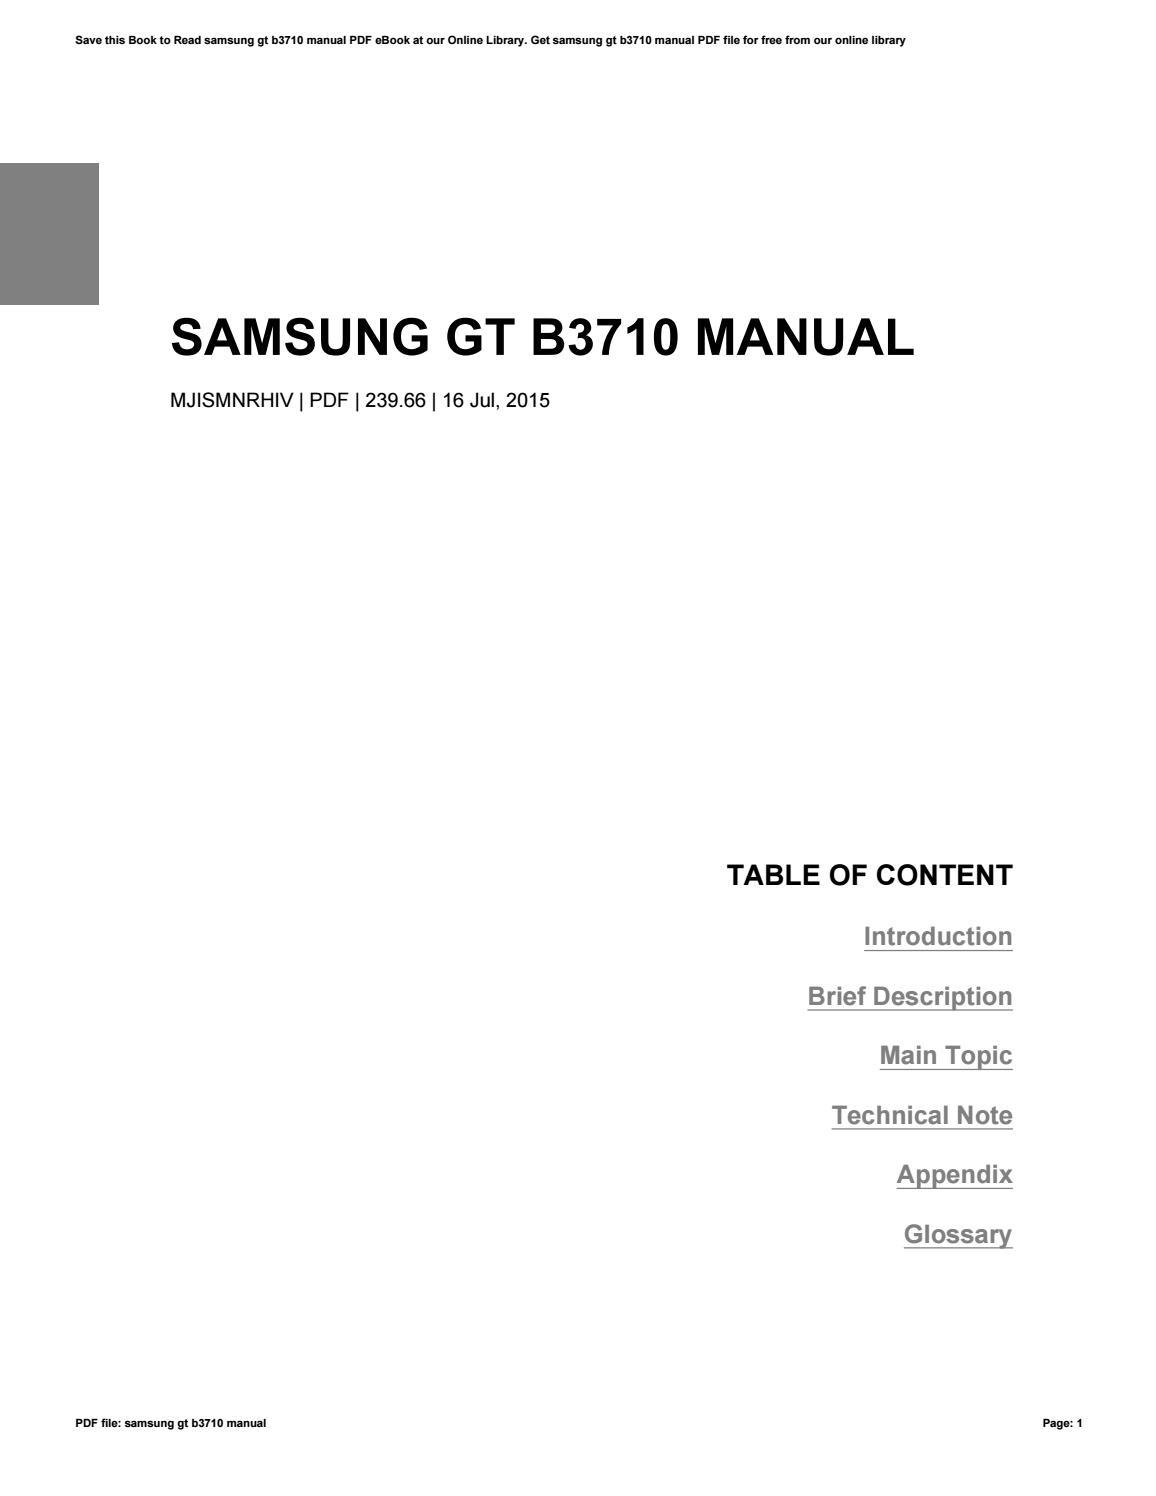 samsung gt b3710 manual by ugimail029 issuu rh issuu com